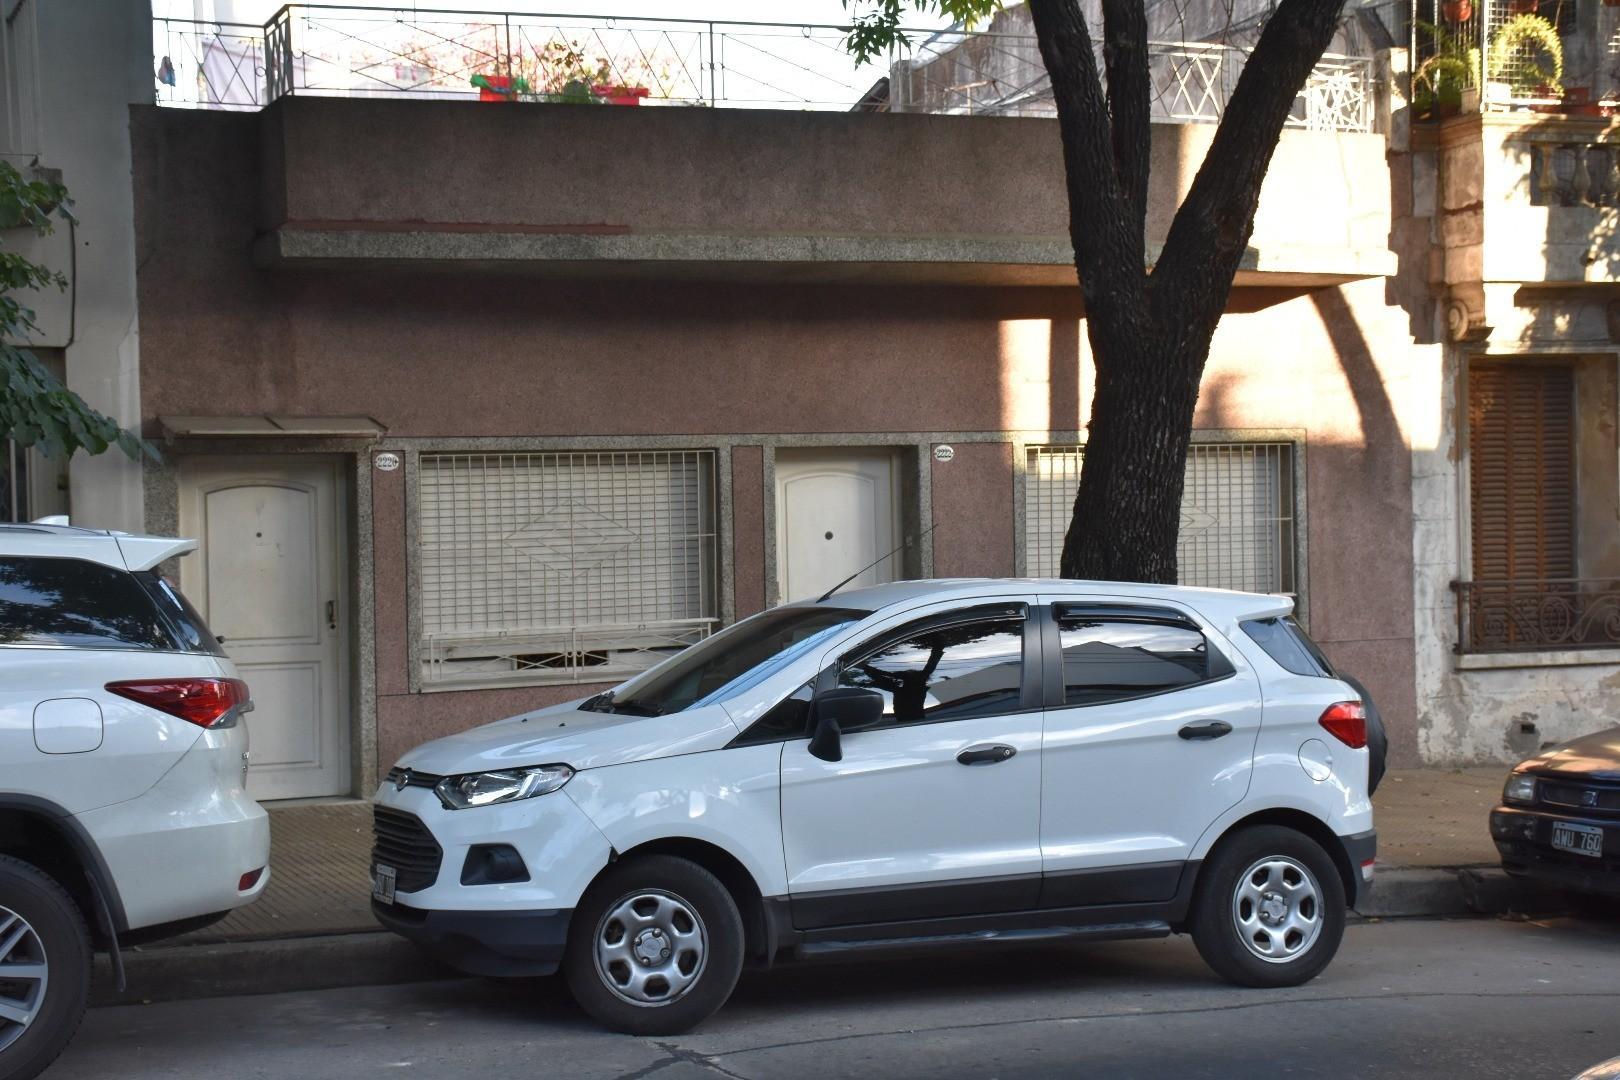 DEPARTAMENTOS TIPO CASA SOBRE LOTE PROPIO DE 8.66 X 50MTS | FLORES | CAPITAL FEDERAL